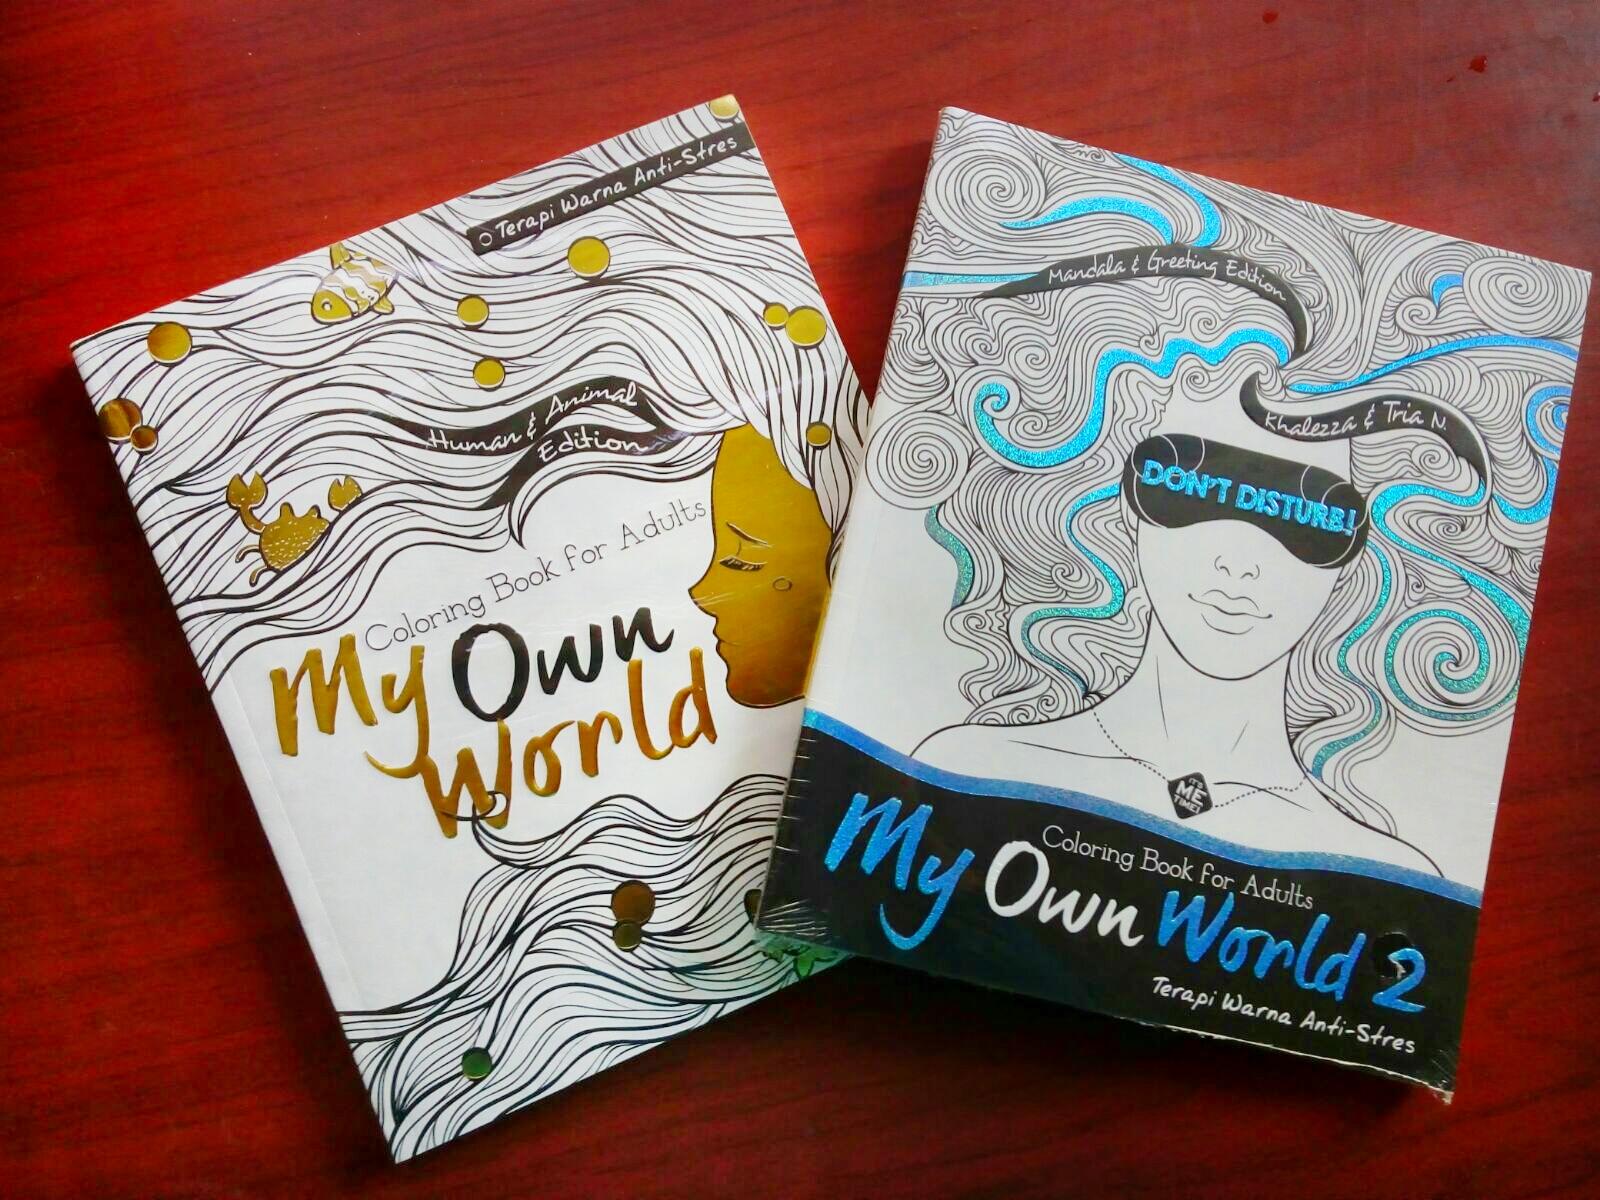 Buku My Own World 1 Dan 2 Gambar Pinjam Dari Sini